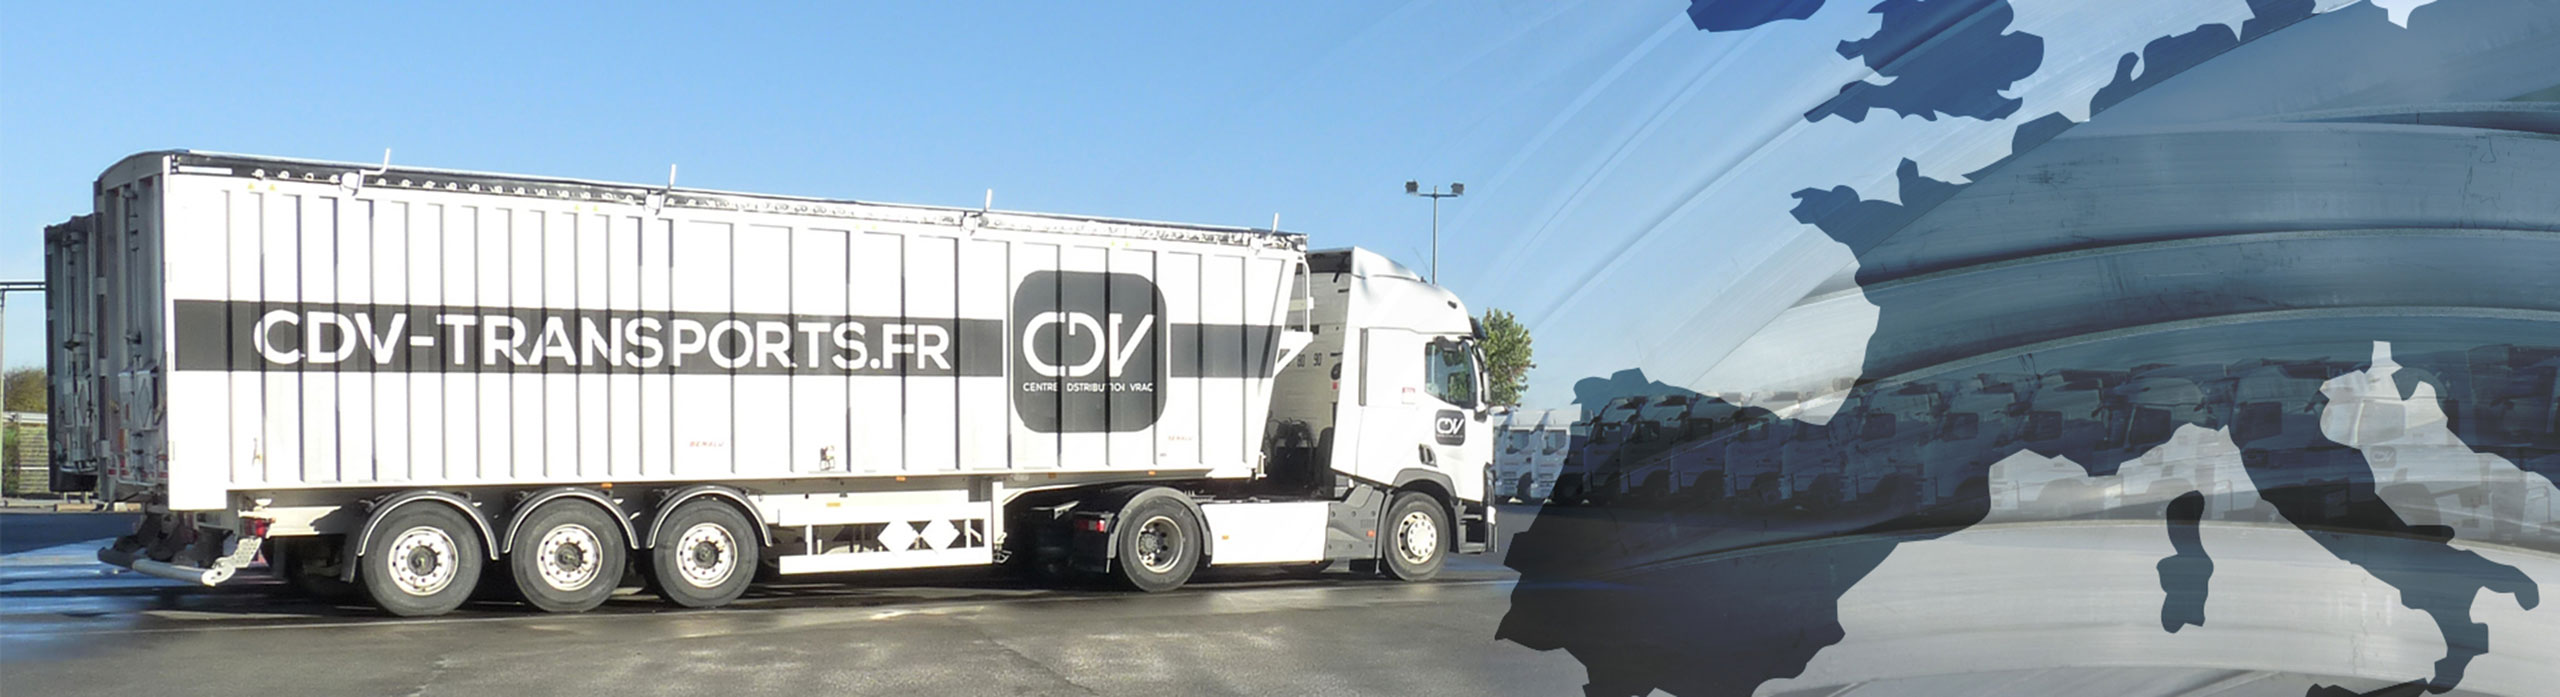 CDV Transports